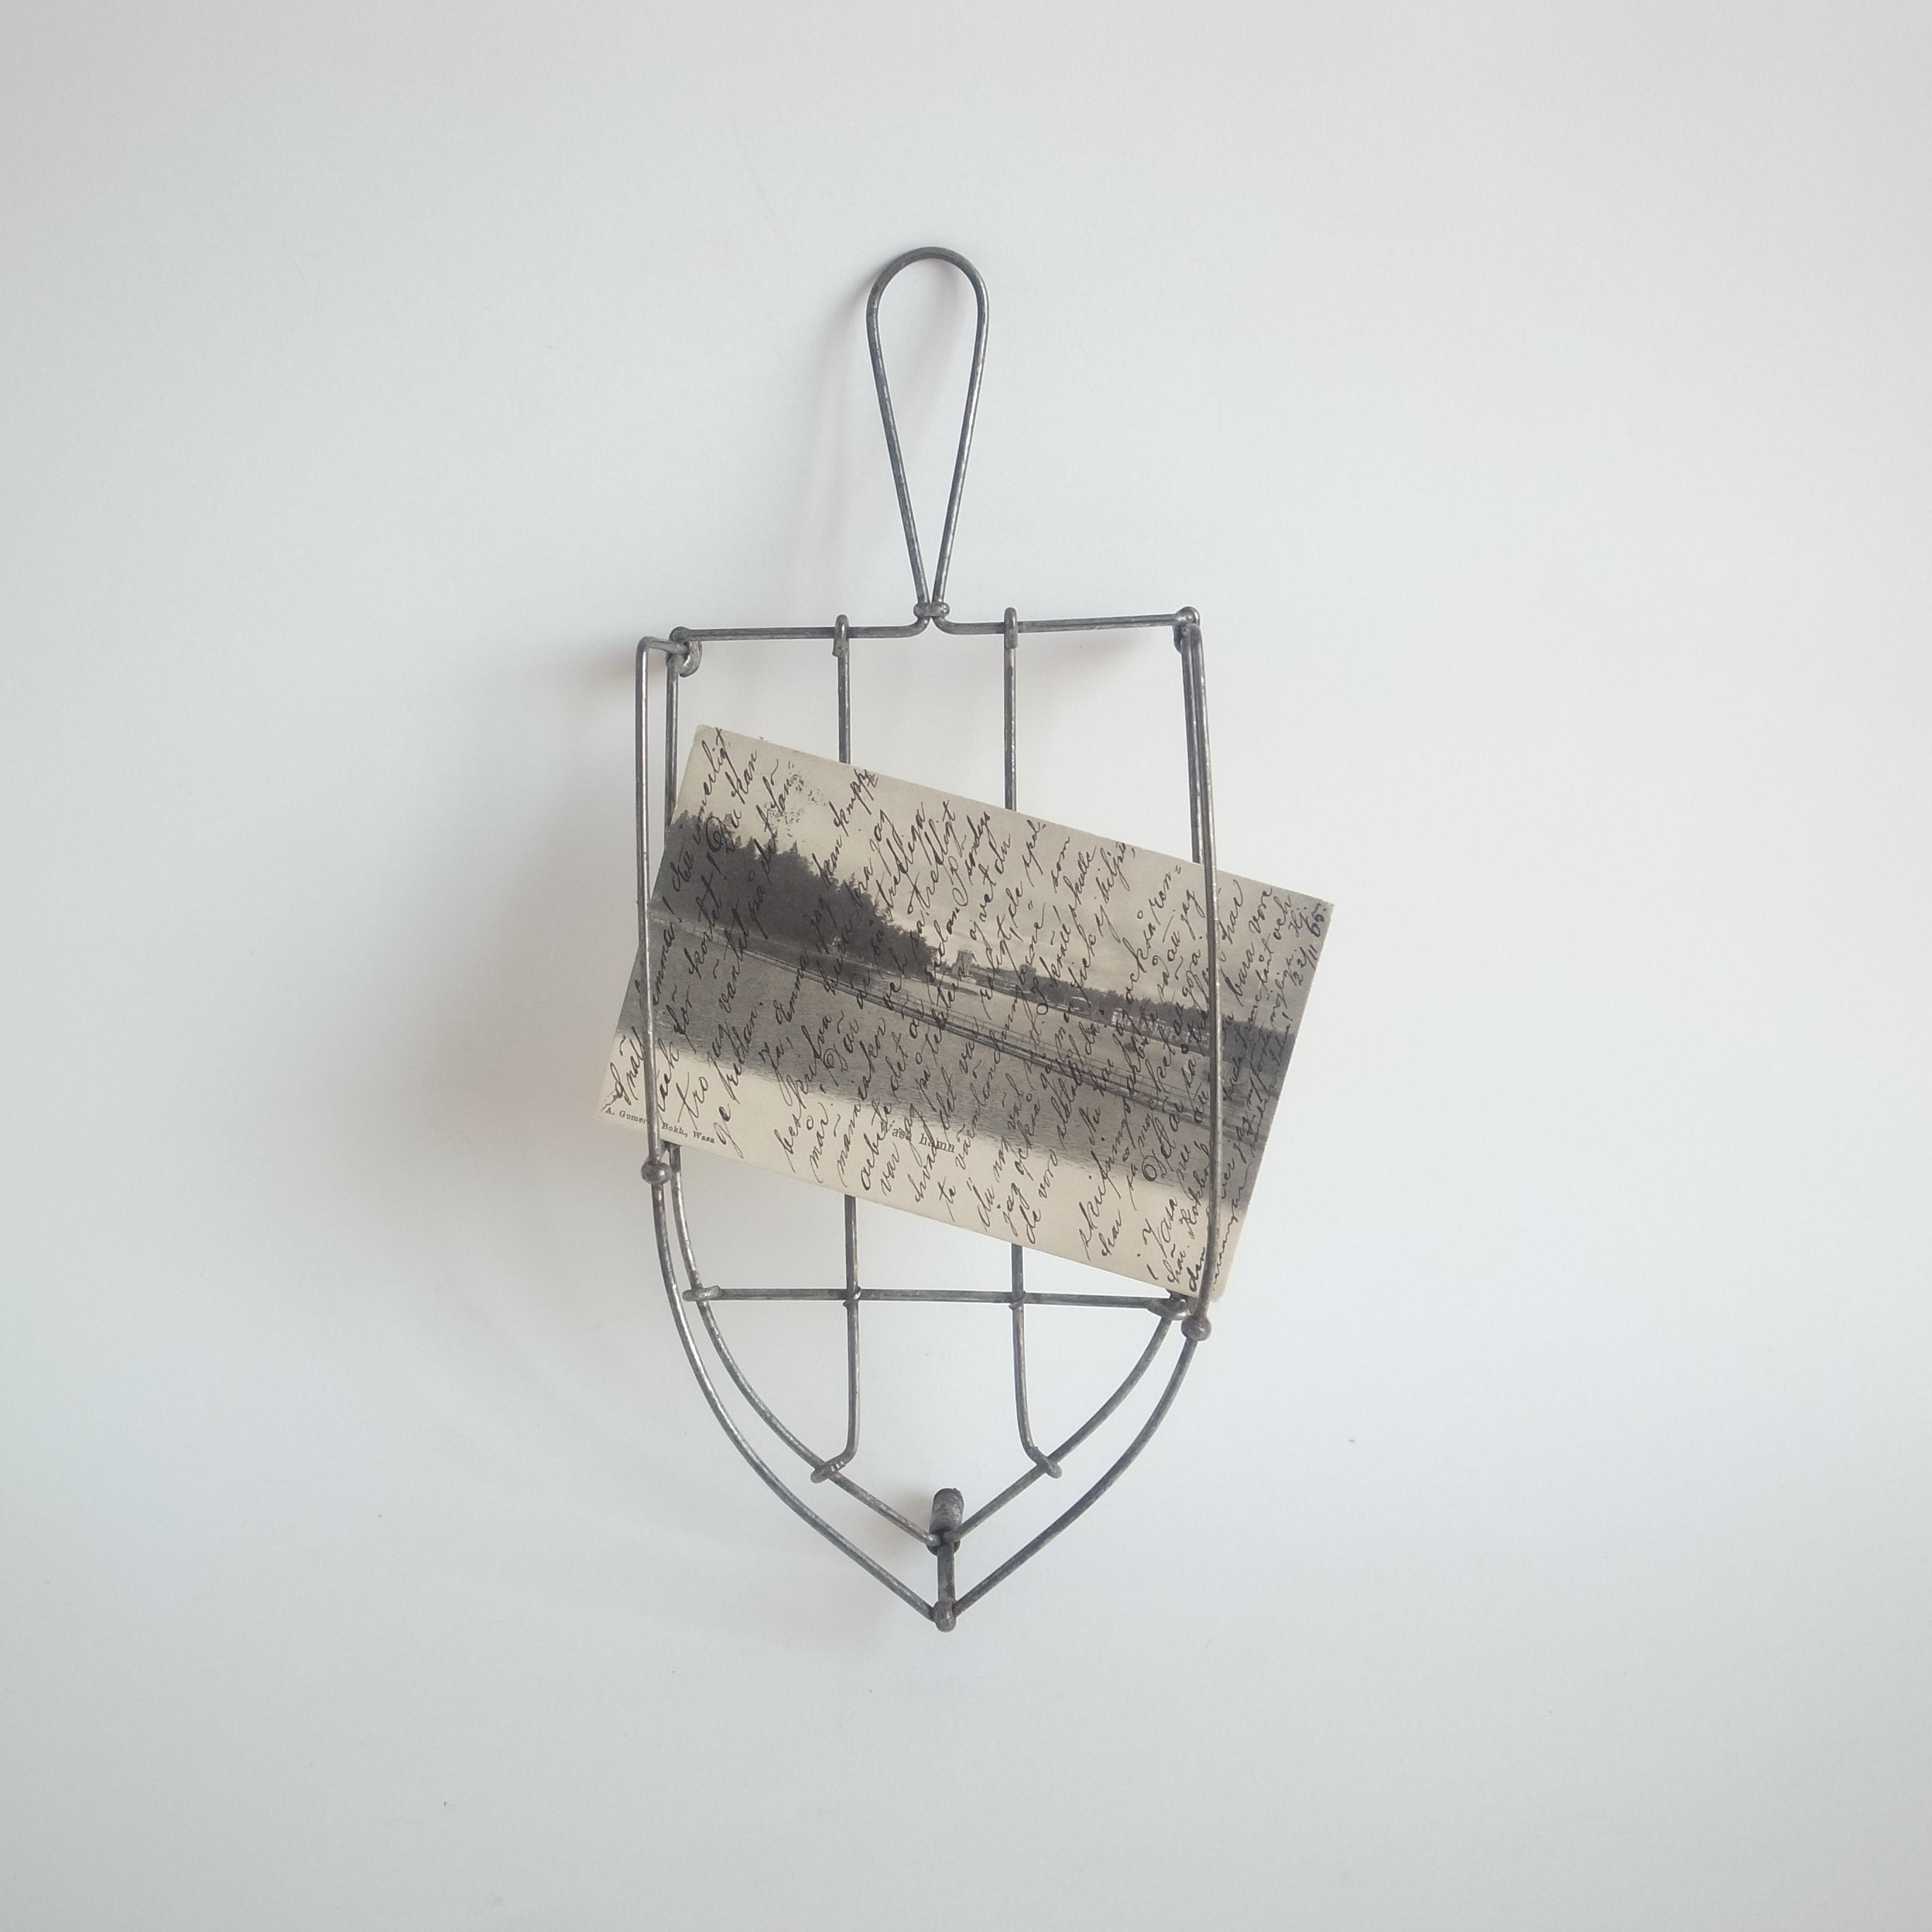 luffarslöjd / Ironing stand